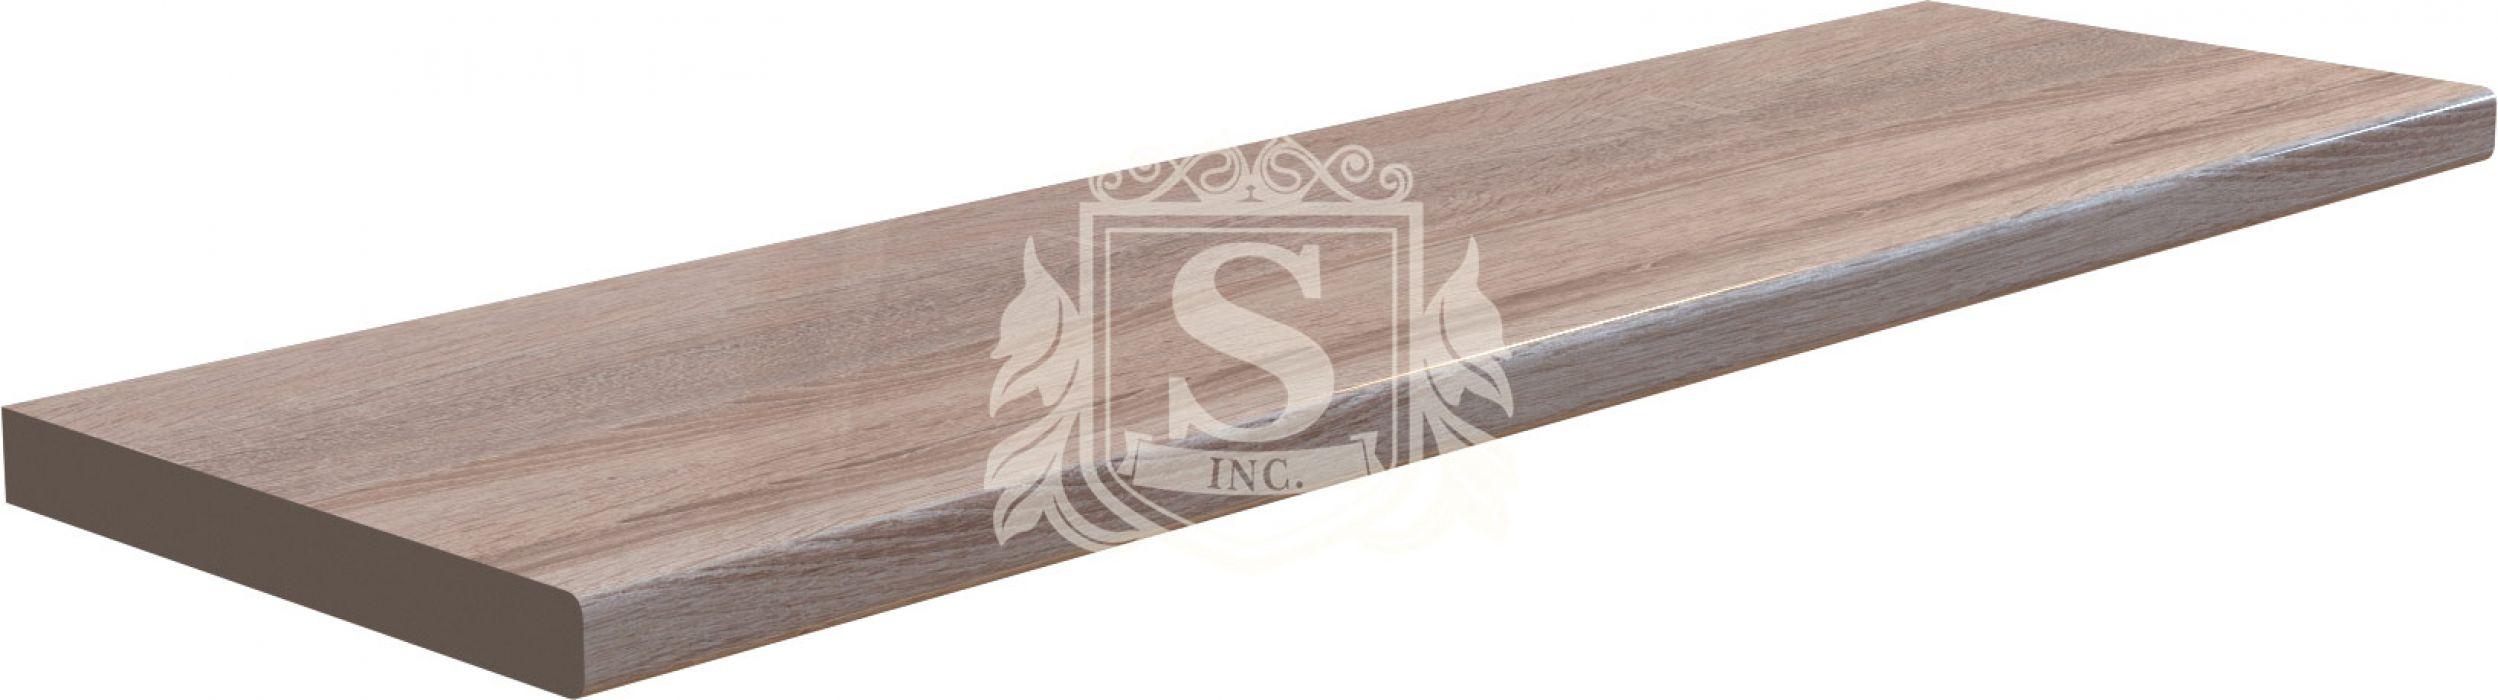 Столешница «Дуб сонома» 1 м.п (38 мм)